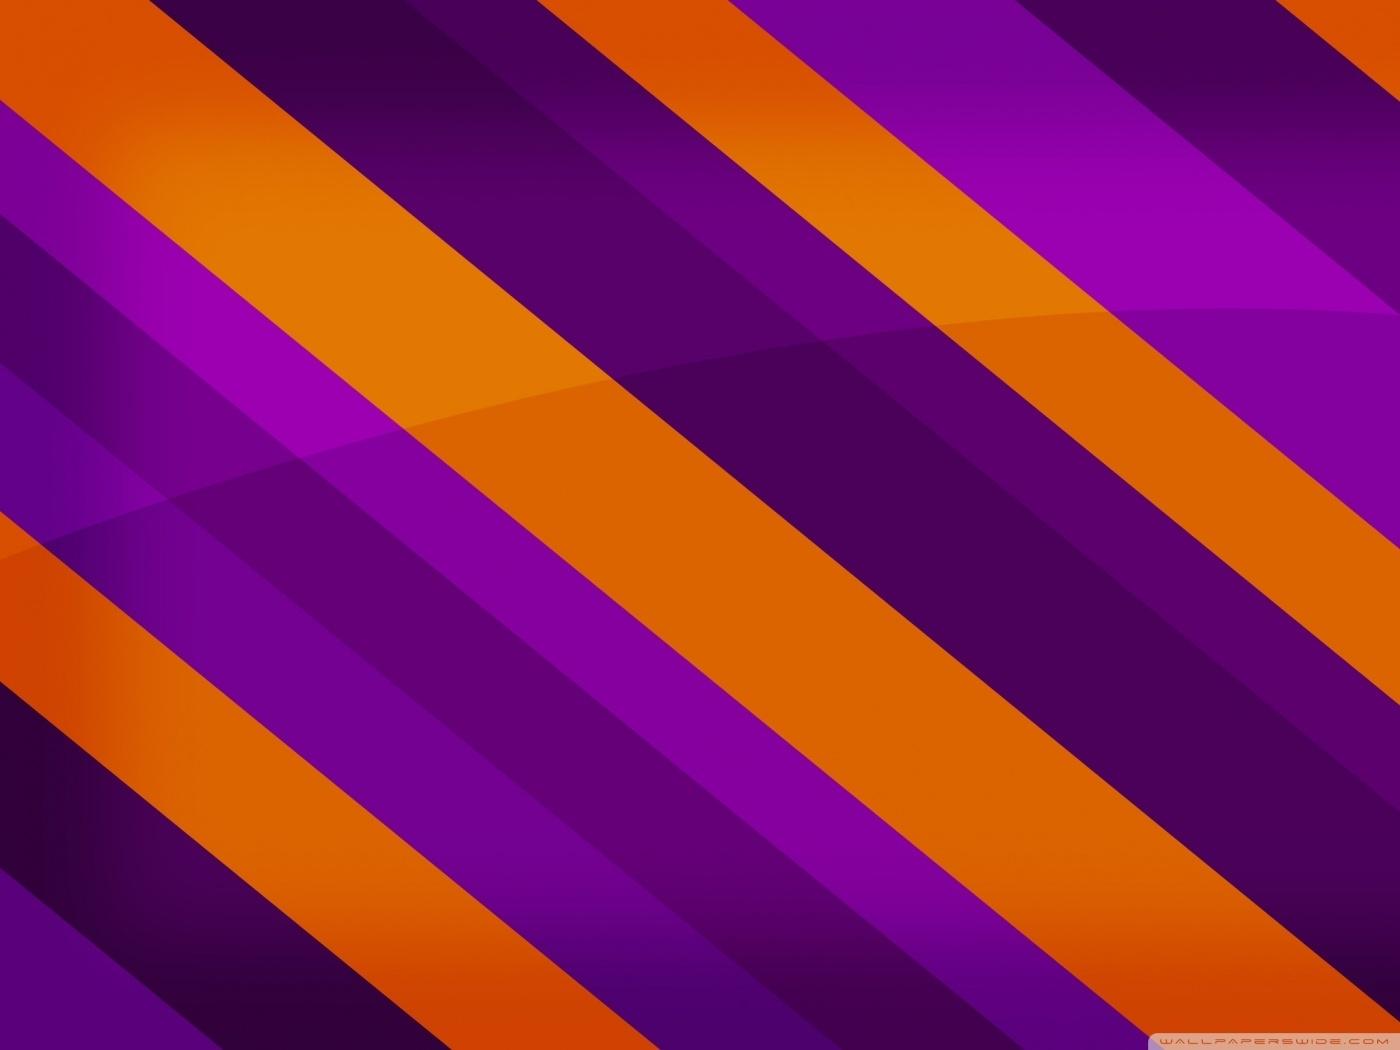 49+ purple and orange backgrounds